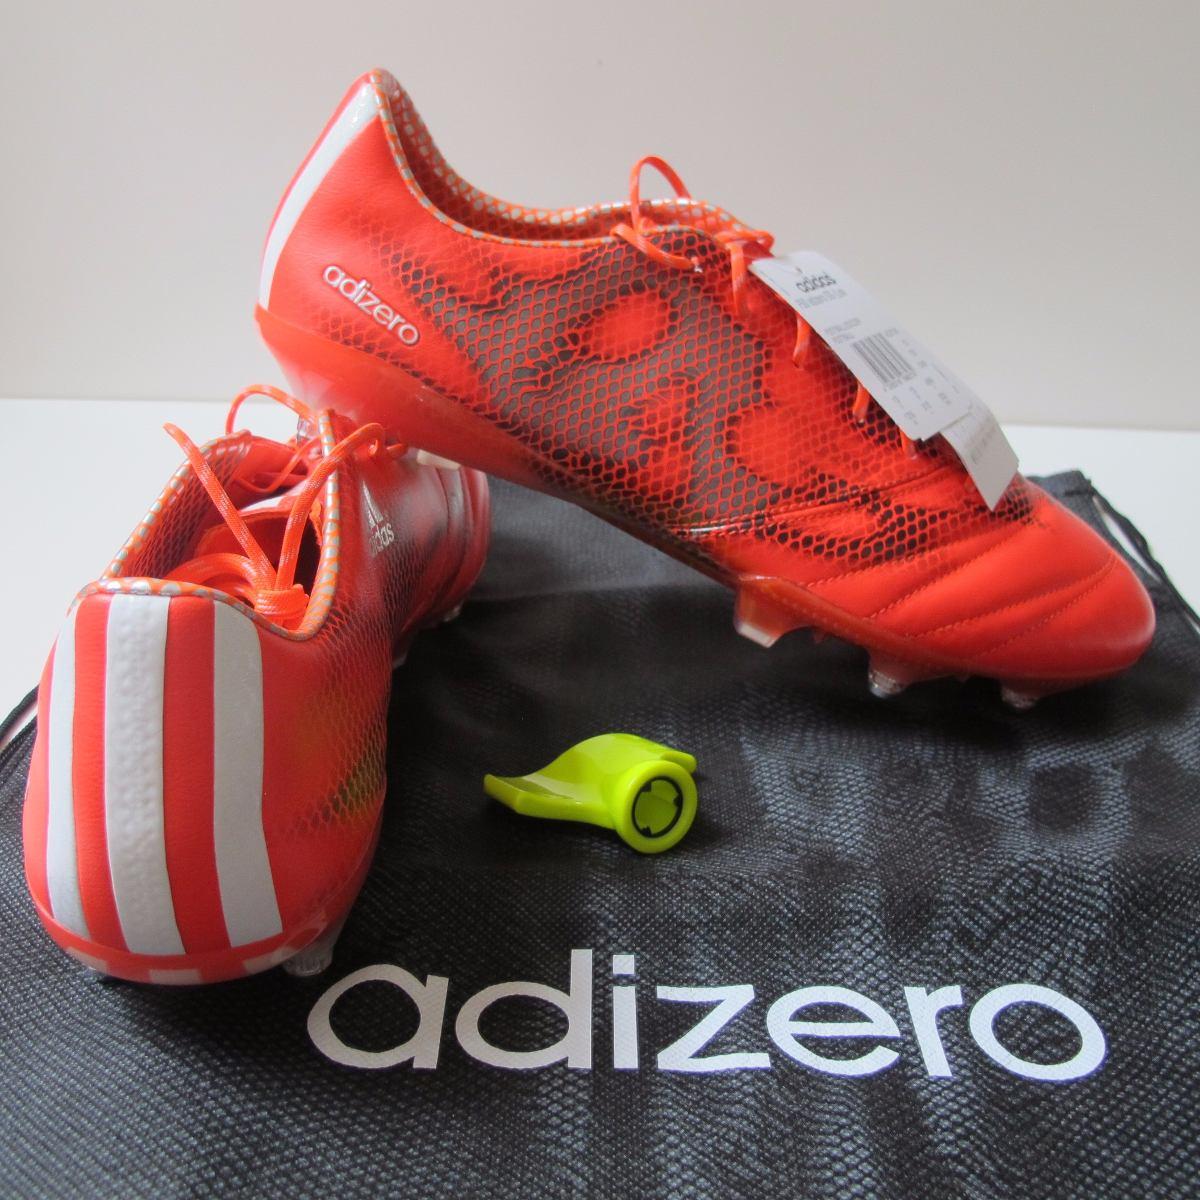 ffb7b9db81 chuteira adidas f50 adizero pro sg couro 100% original. Carregando zoom.